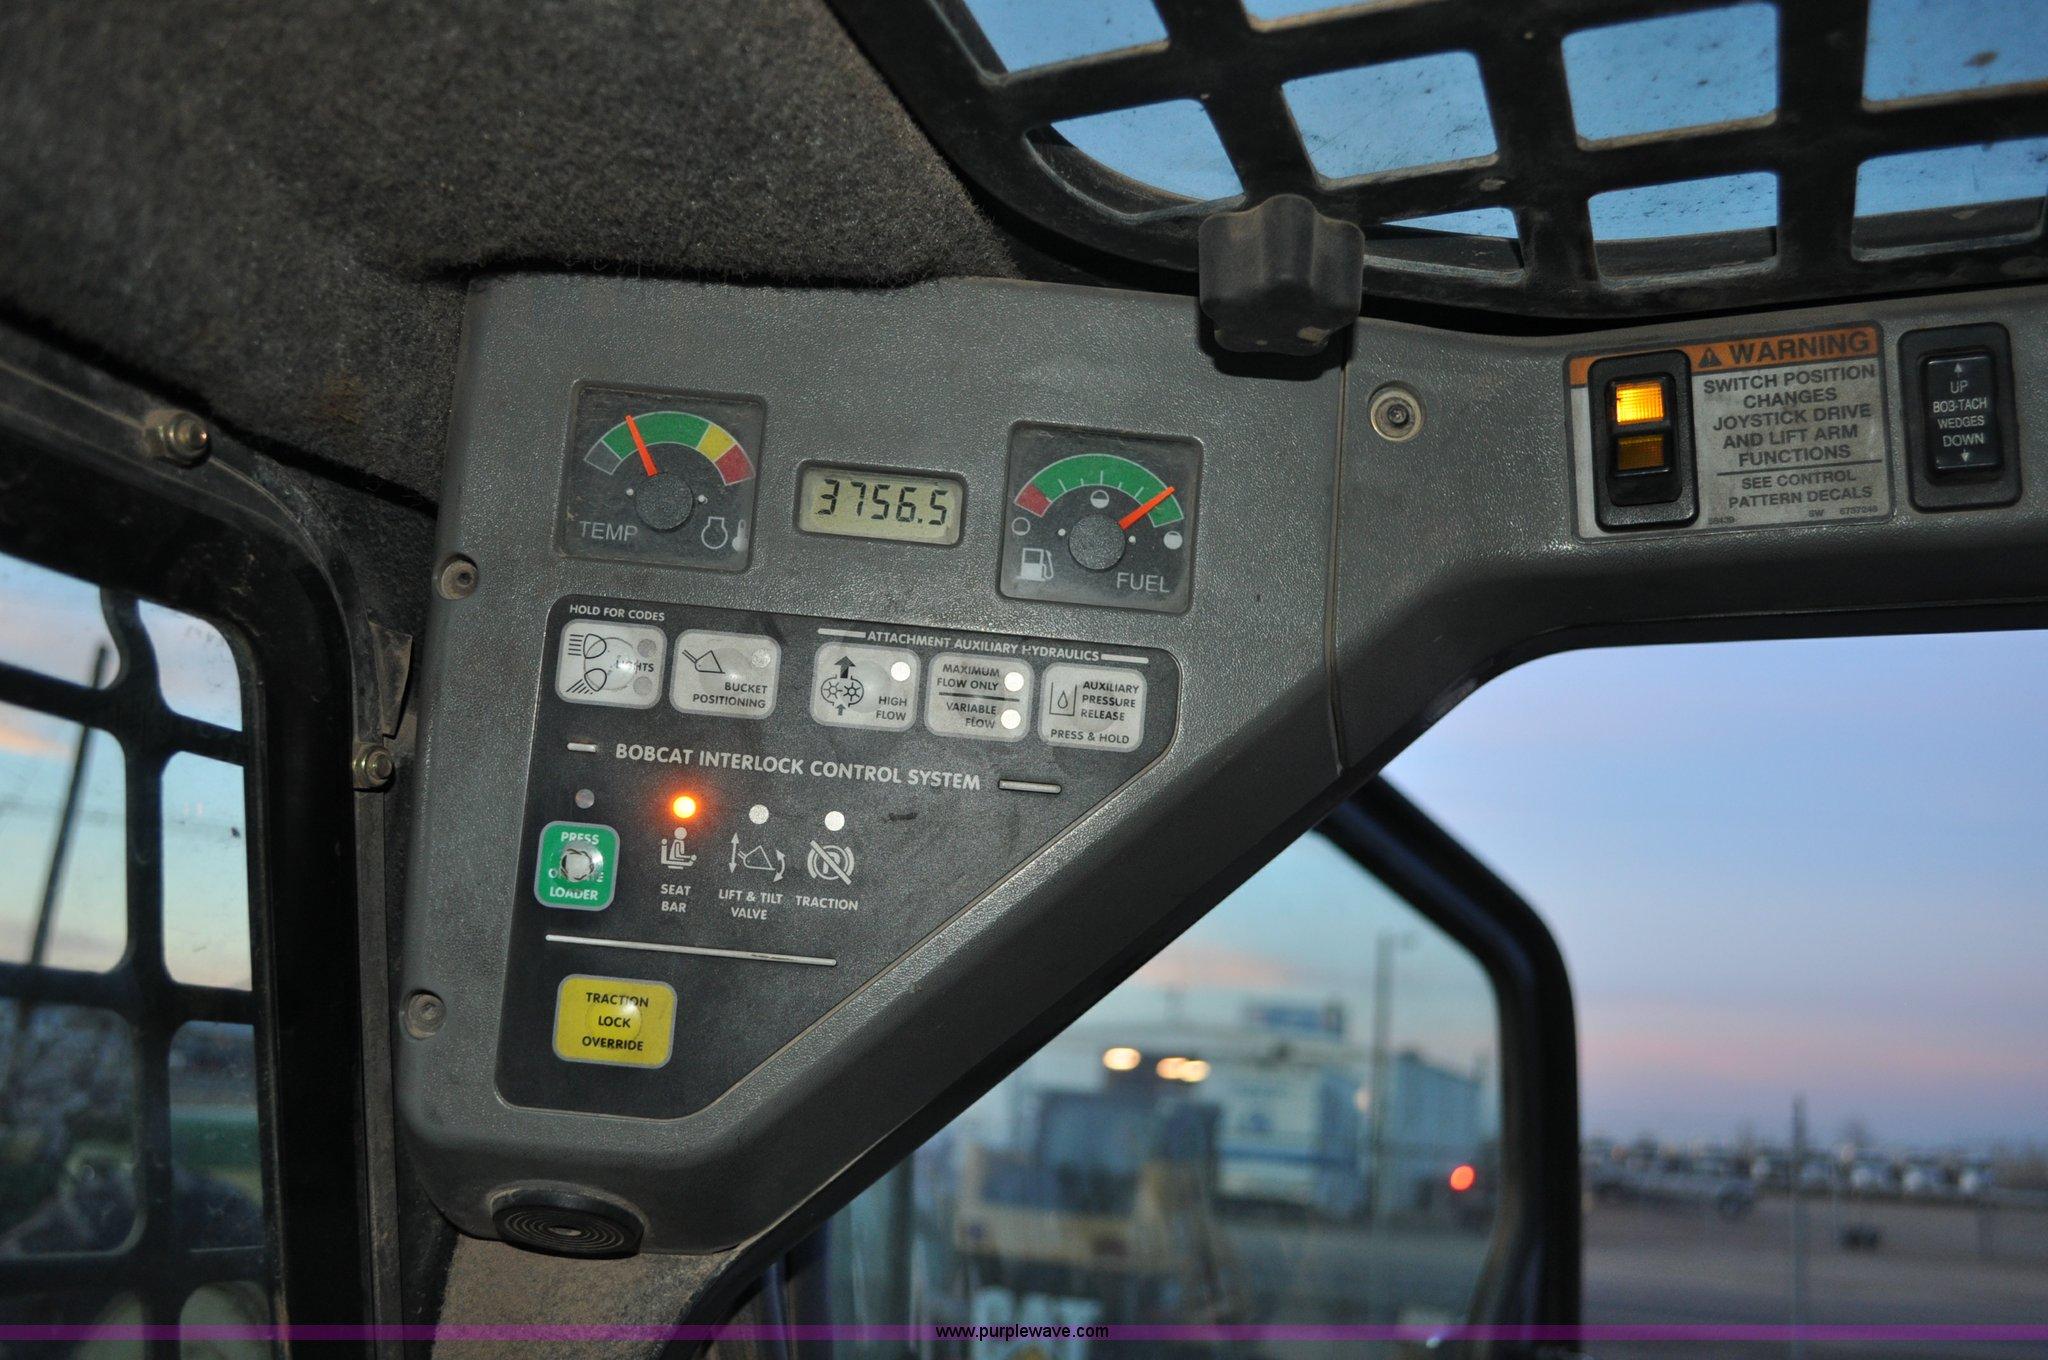 2008 Bobcat T320 track skid steer | Item G6353 | SOLD! Janua